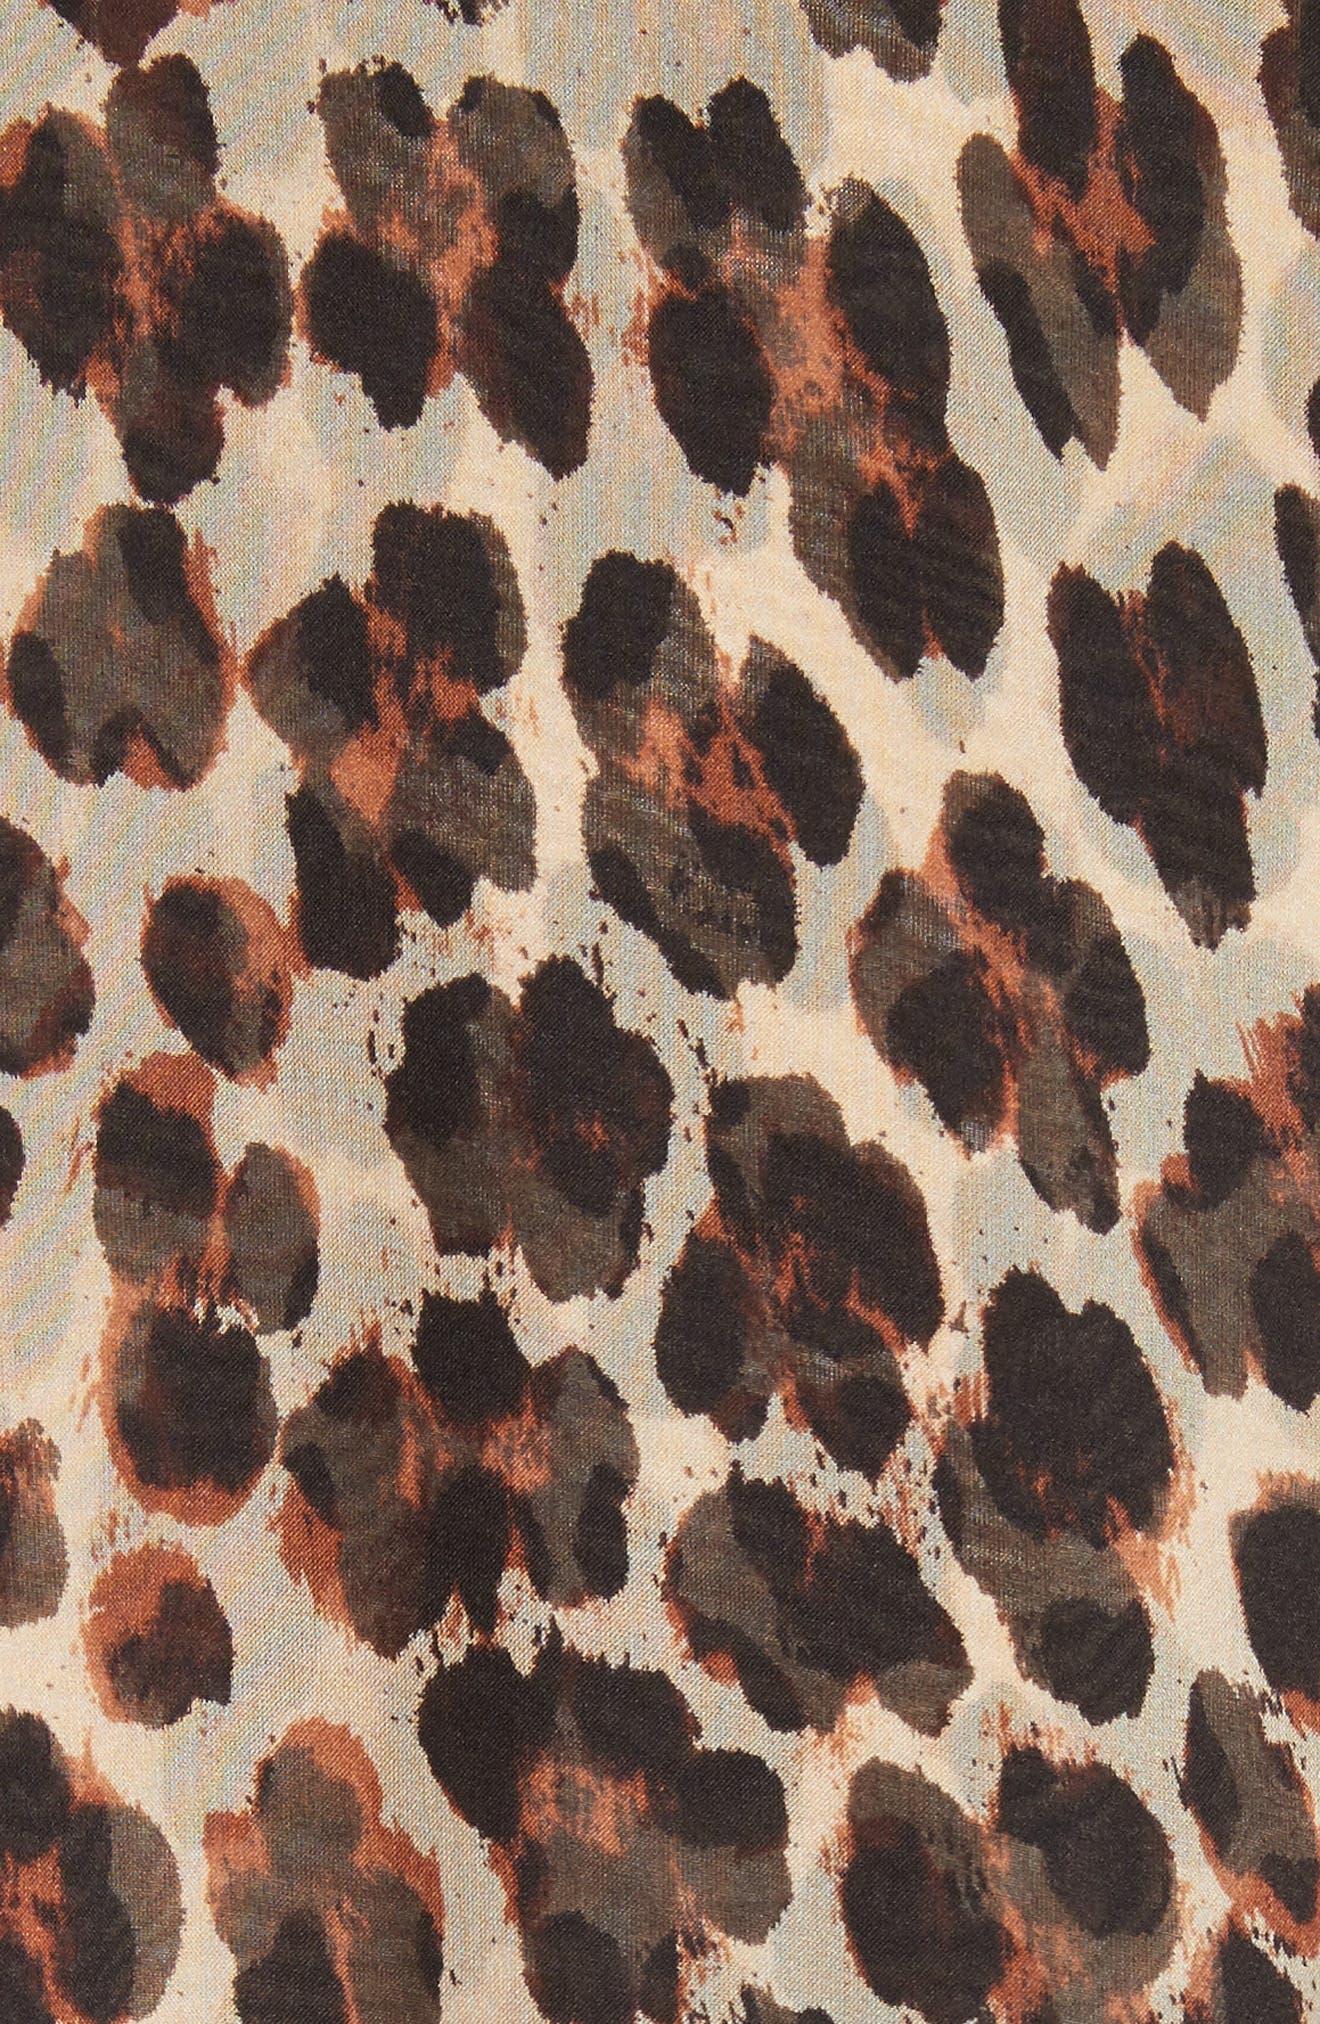 Olena Silk Dress,                             Alternate thumbnail 5, color,                             202